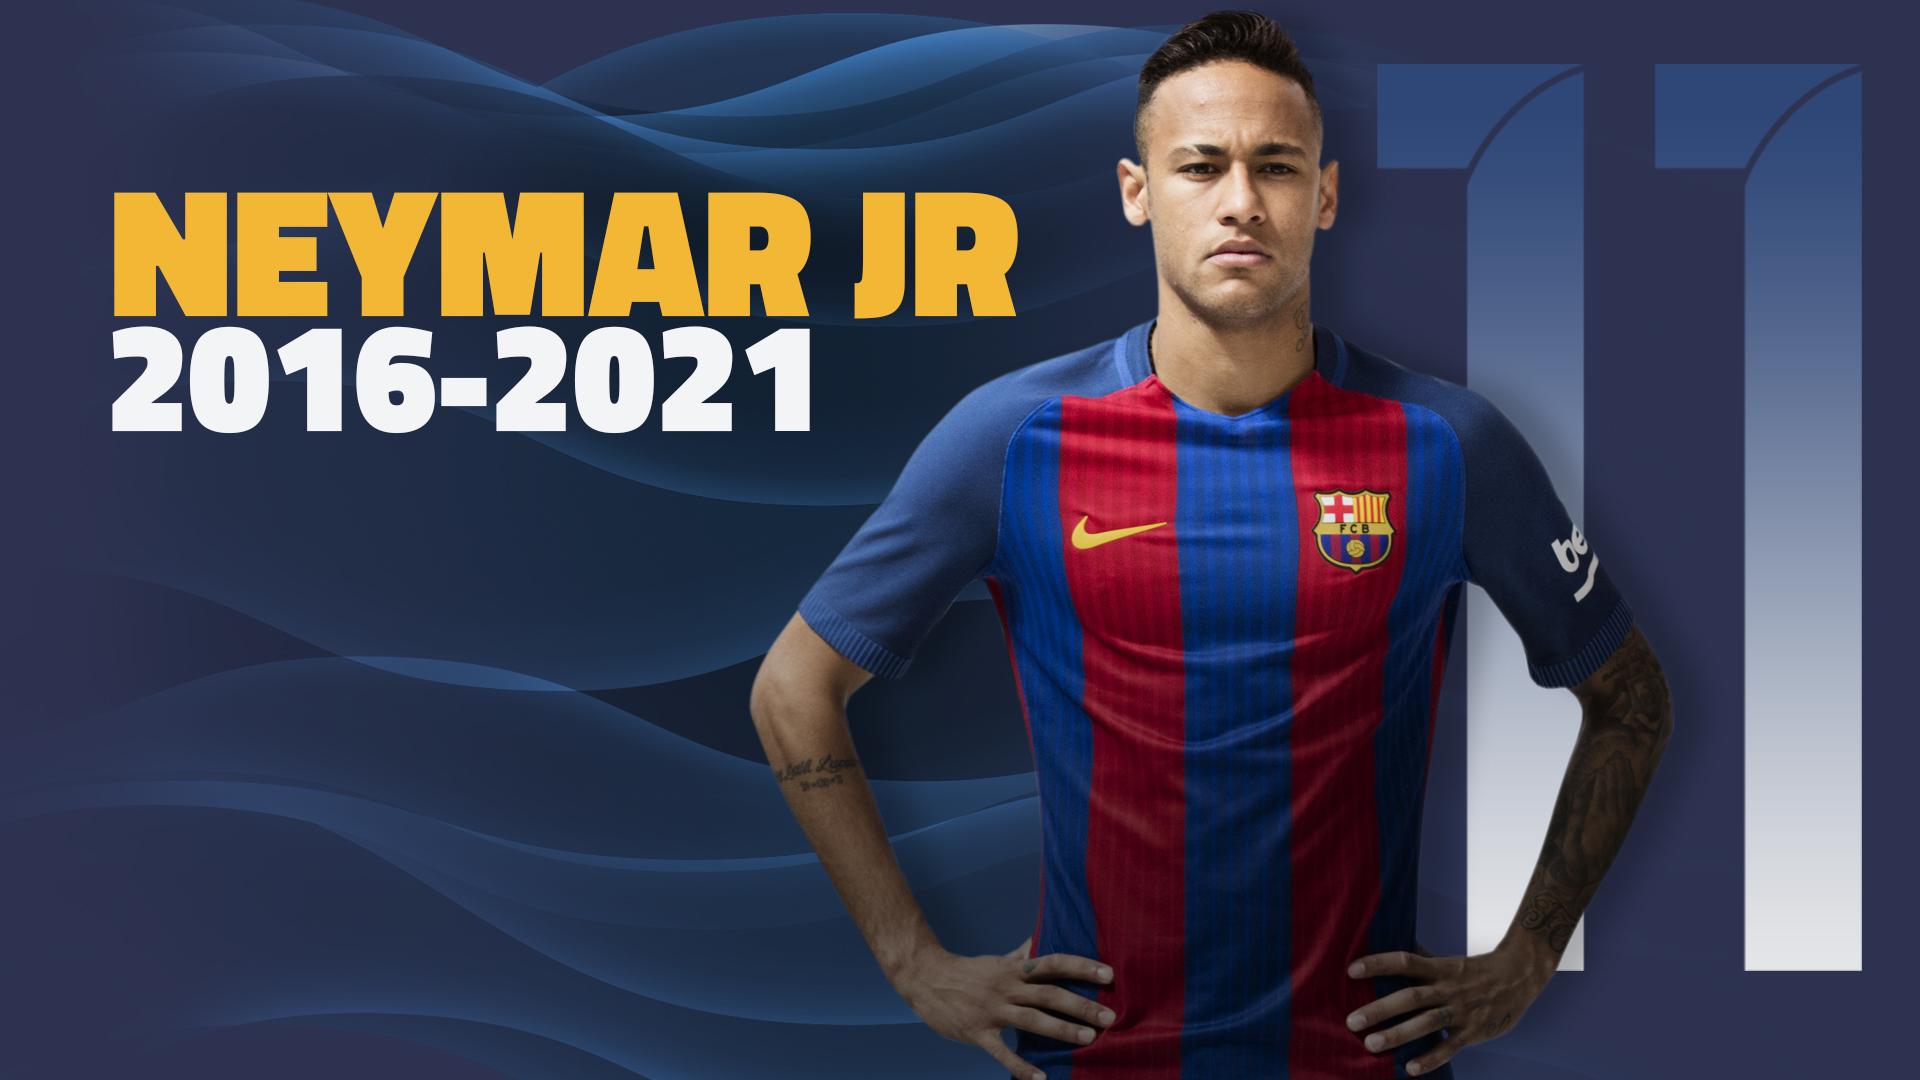 neymar extends contract until 2021 neymar extends contract until 2021